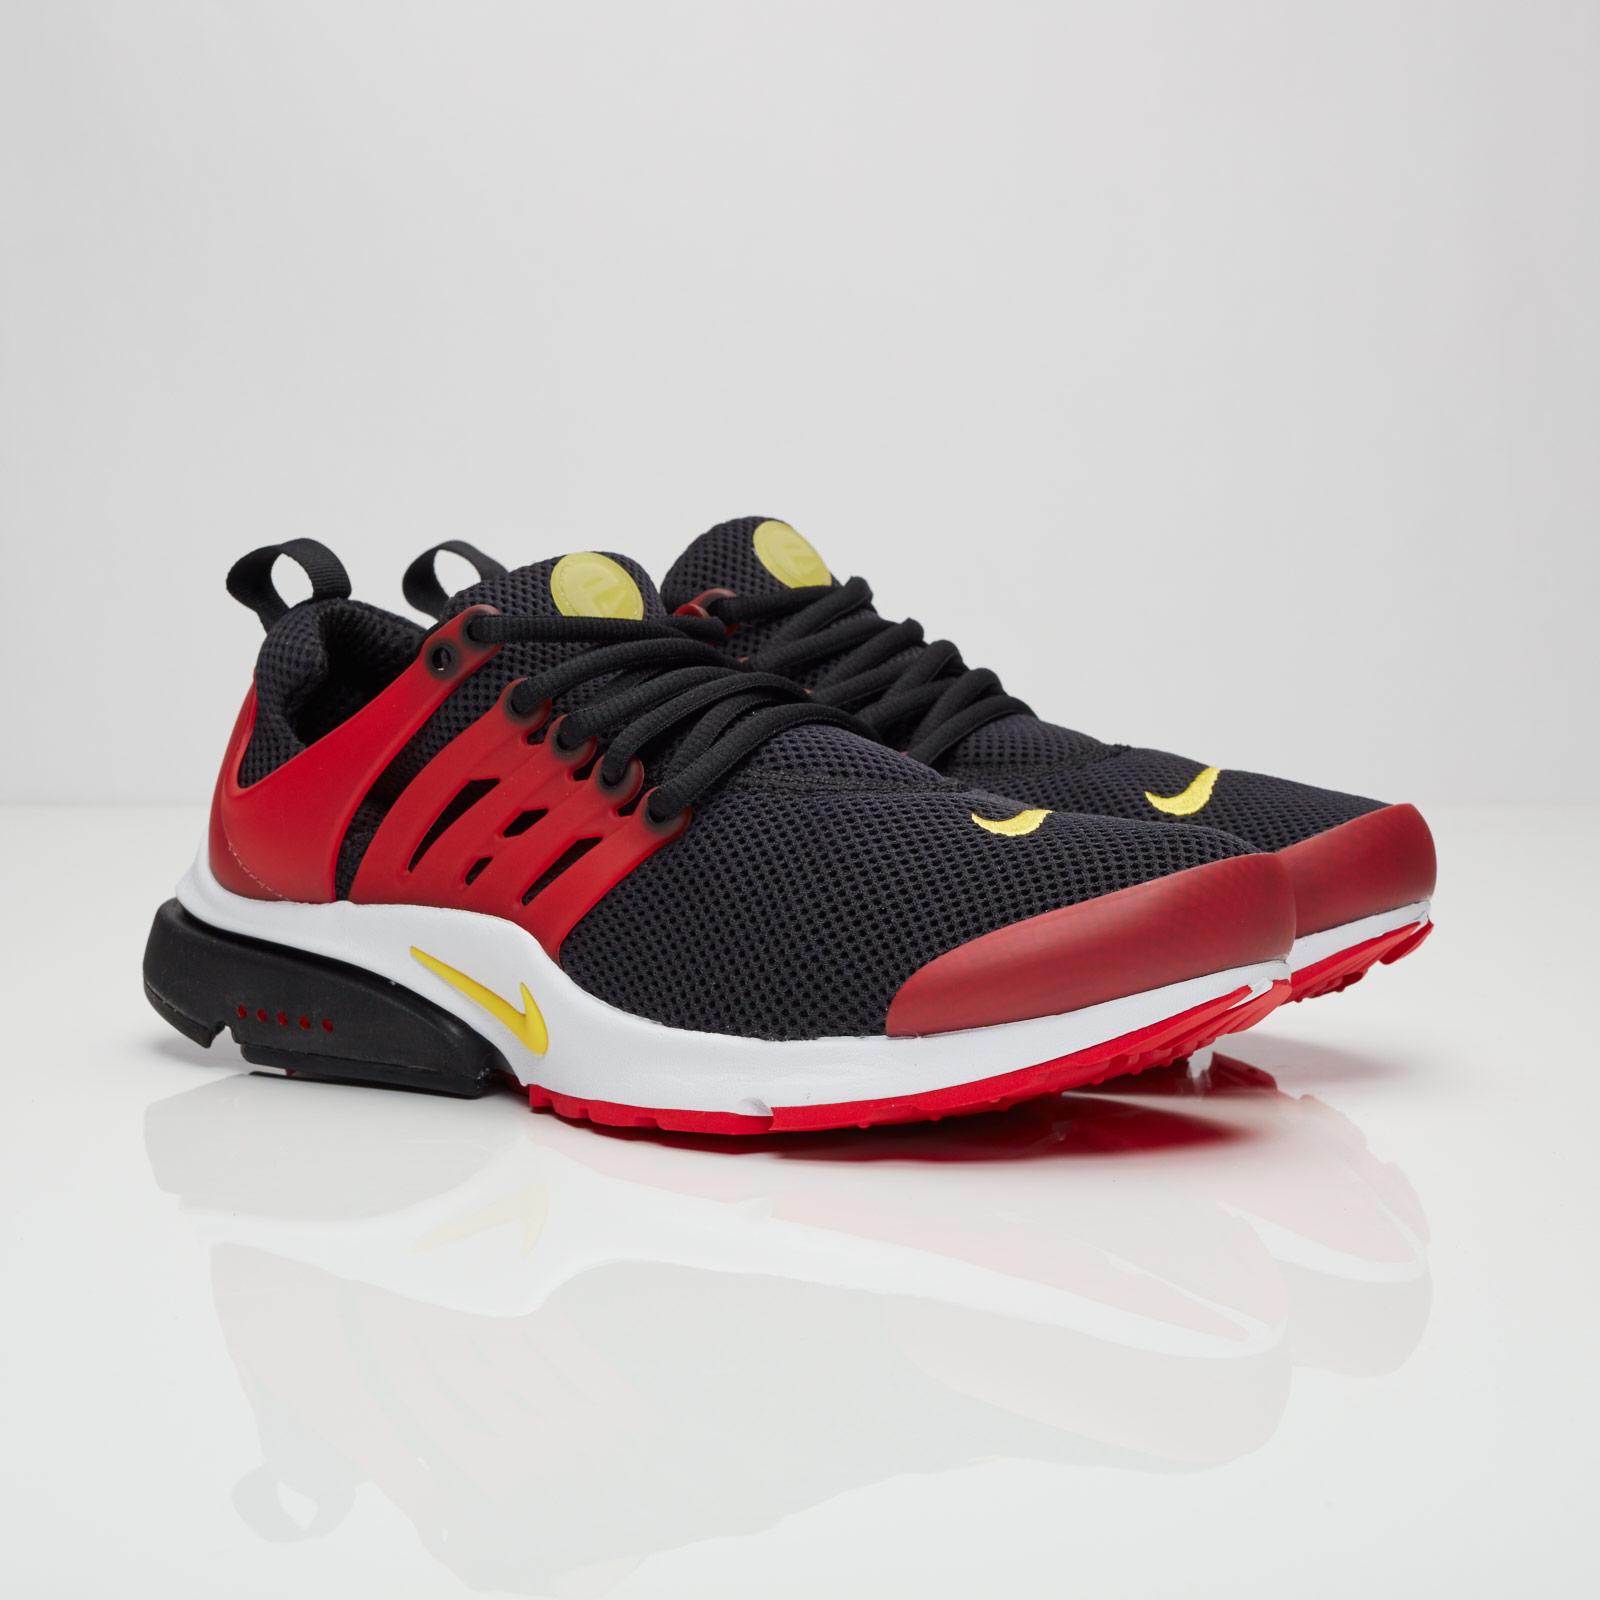 af4dfd7826cb Nike Air Presto Essential - 848187-006 - Sneakersnstuff